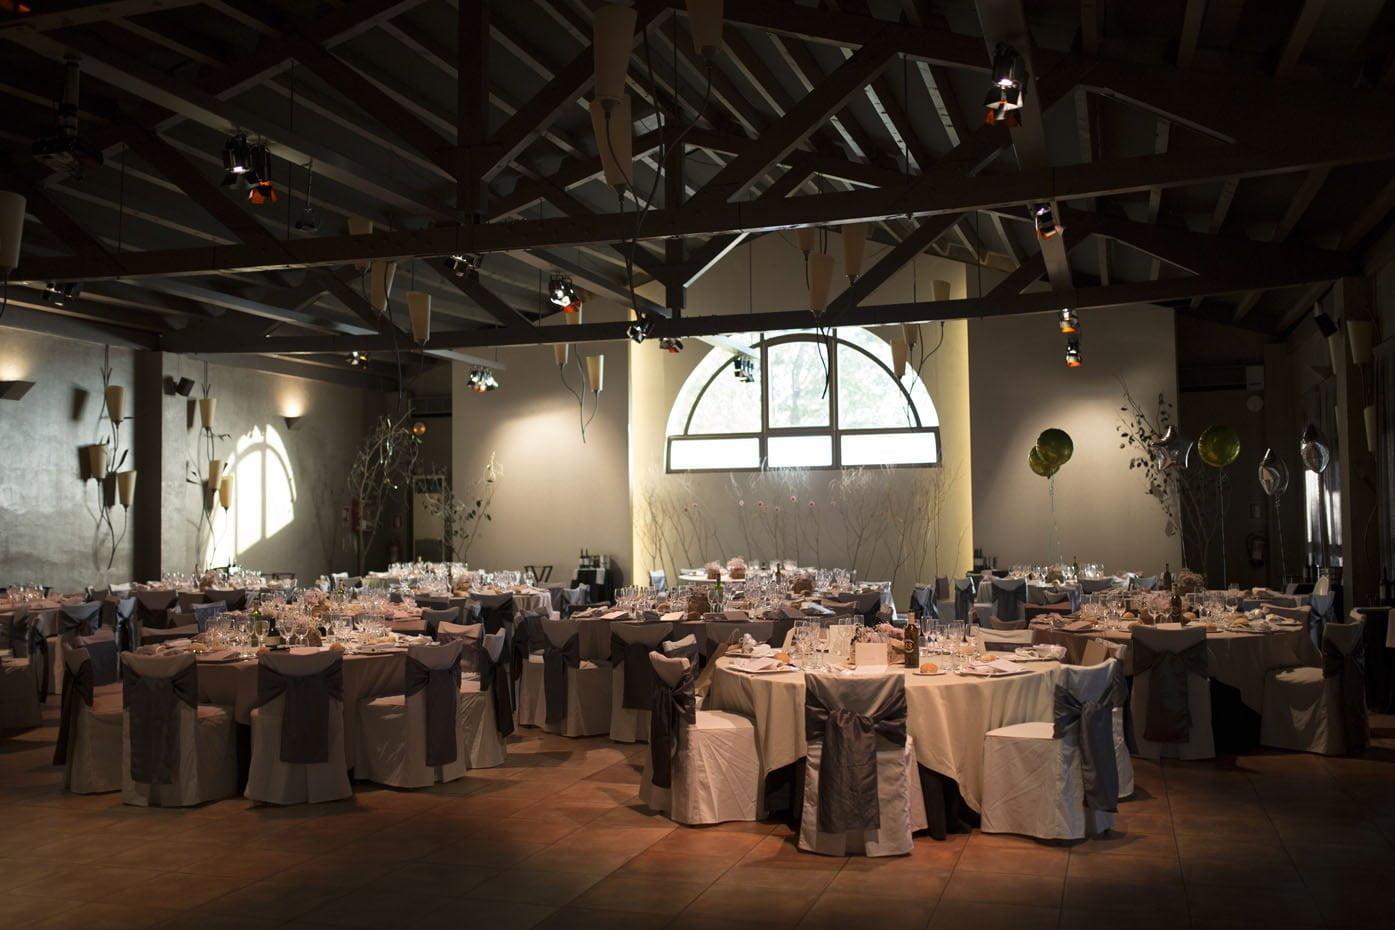 Casament-can-macia-espai-gastronomia4